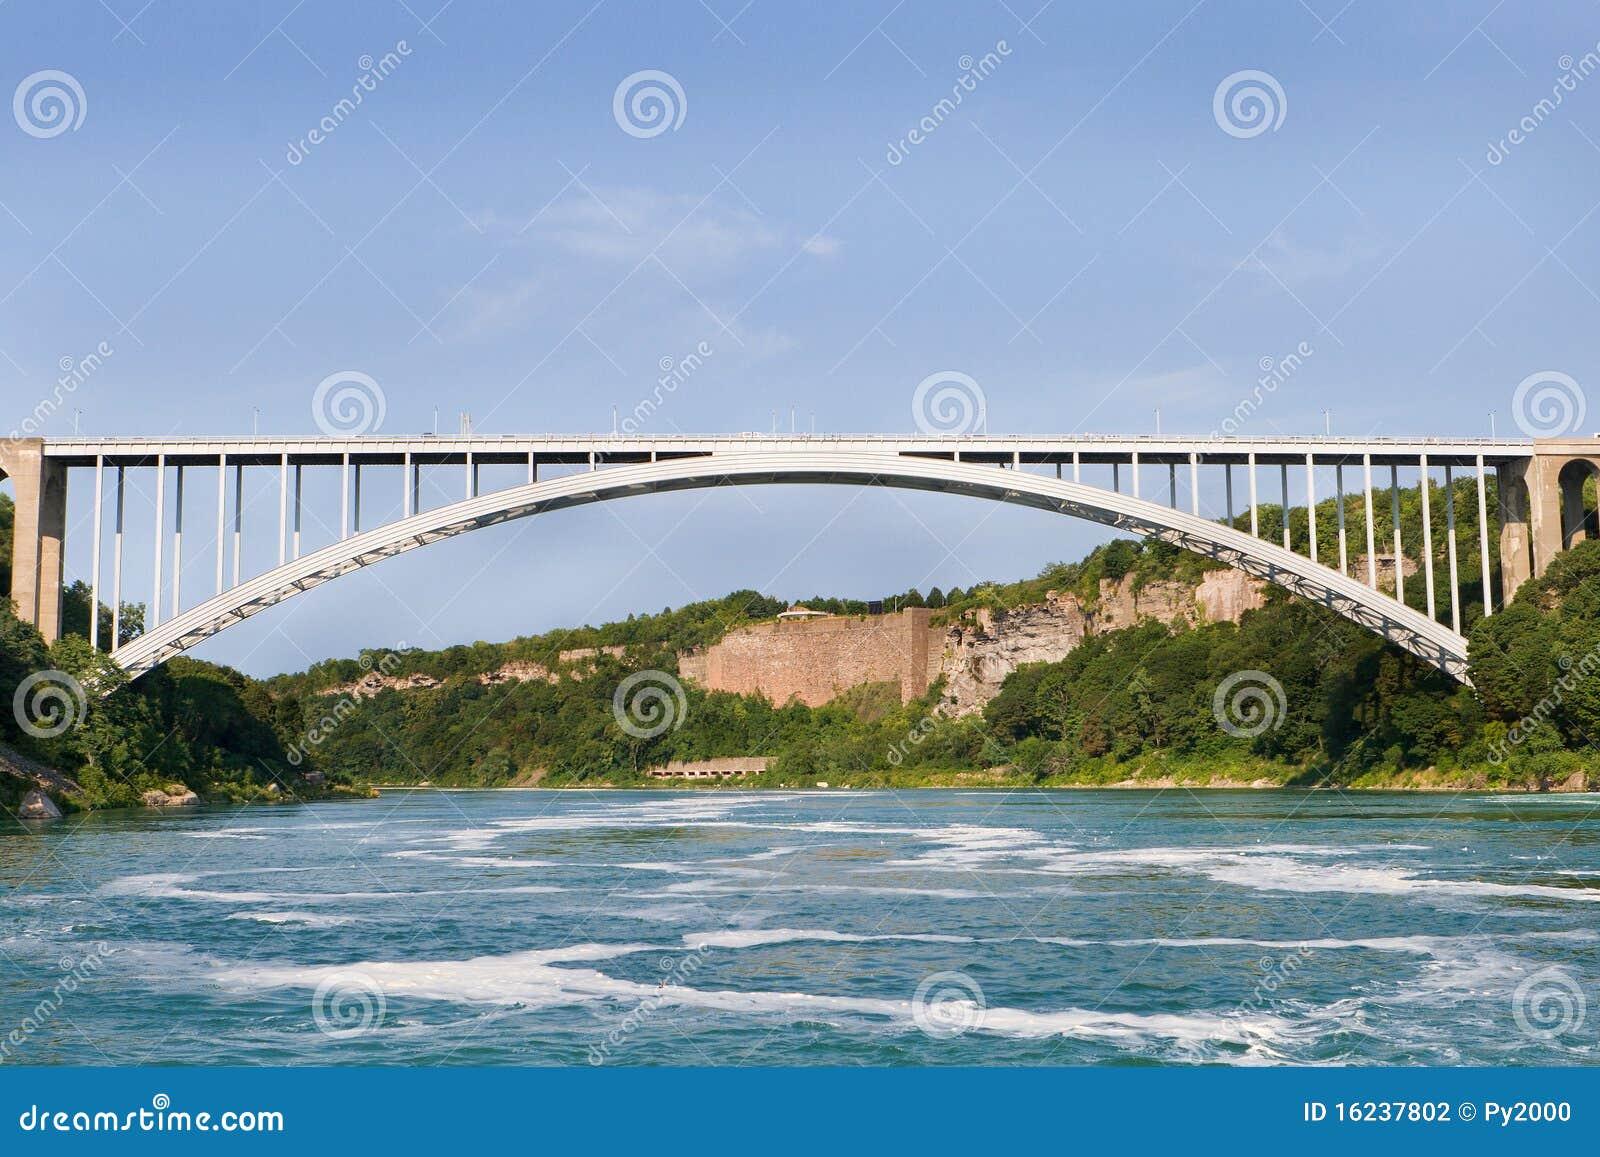 Rainbow Bridge of Niagara Falls